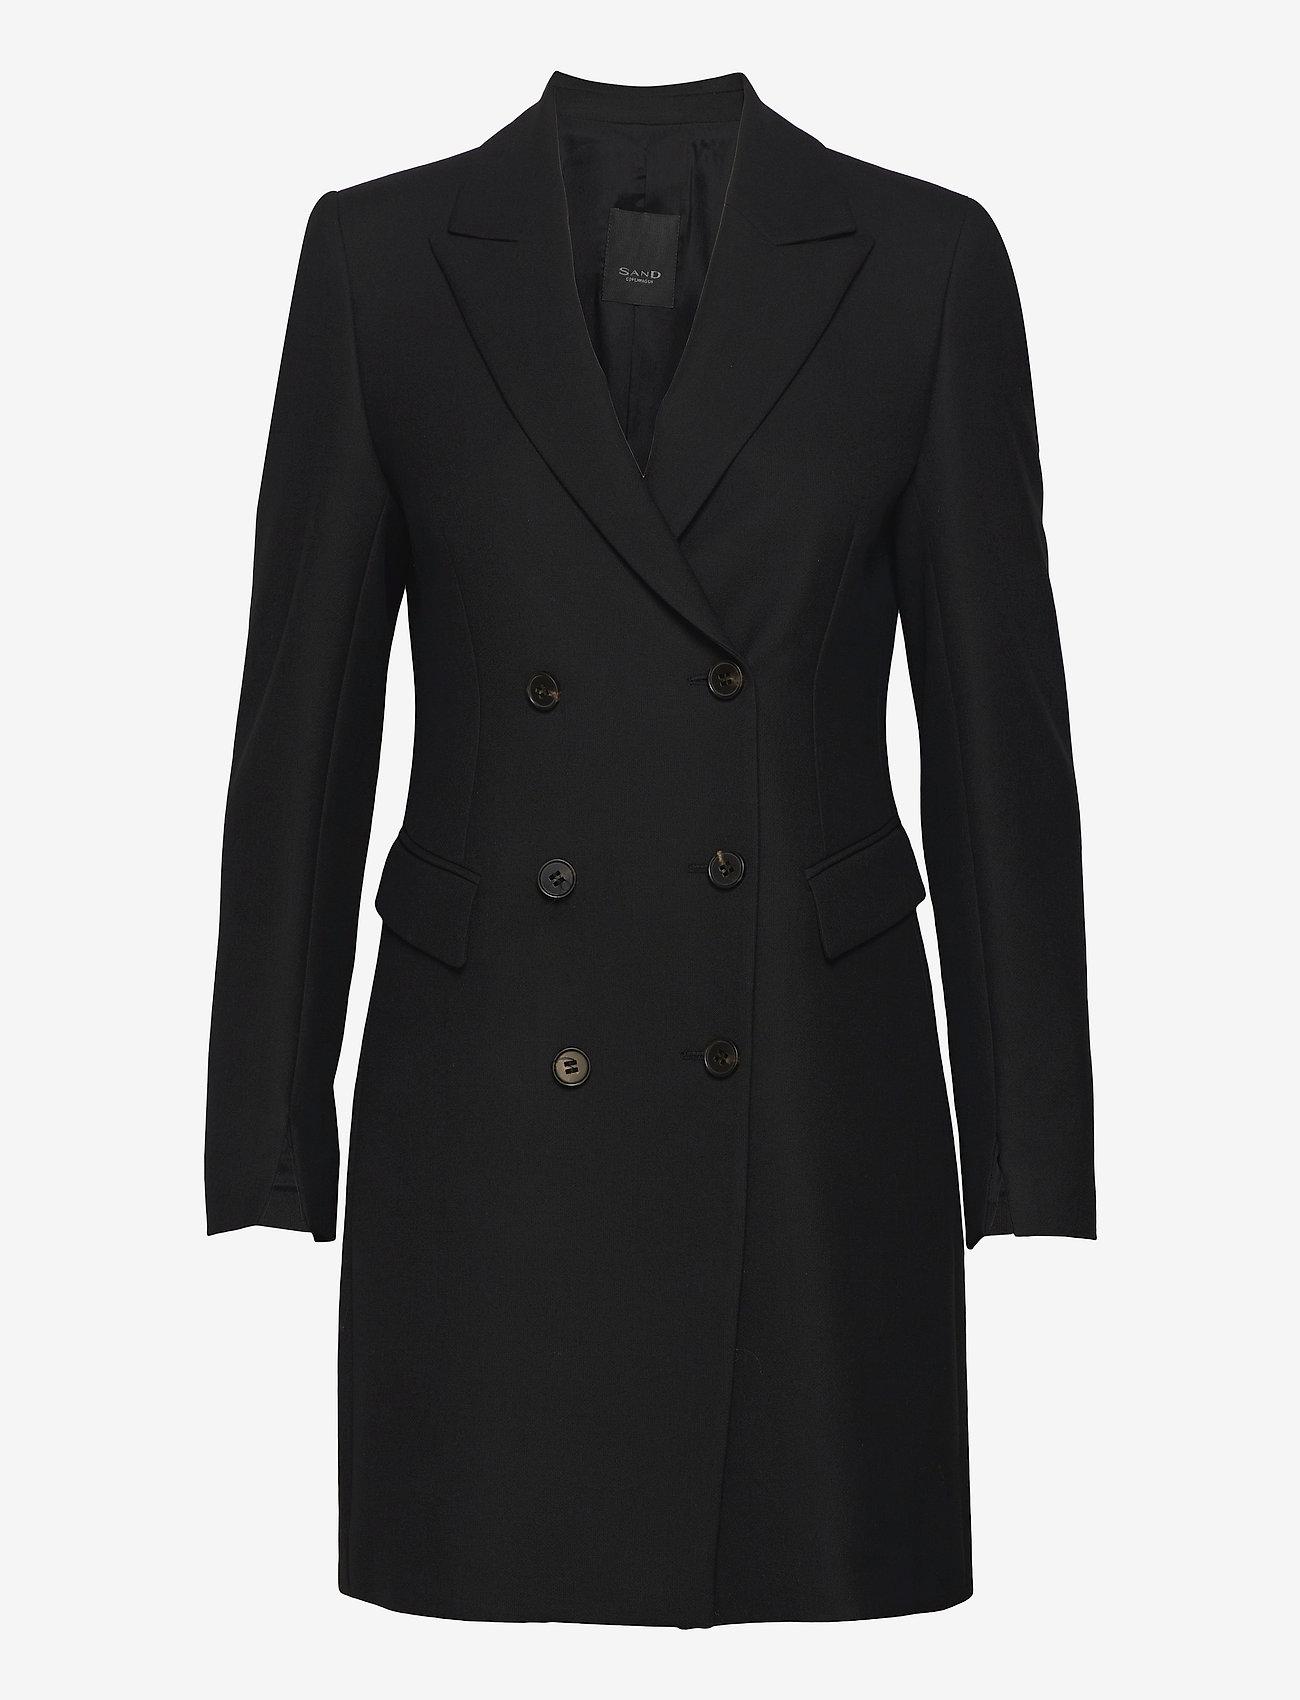 SAND - 3596 - Keiko Dress - dunne jassen - black - 0